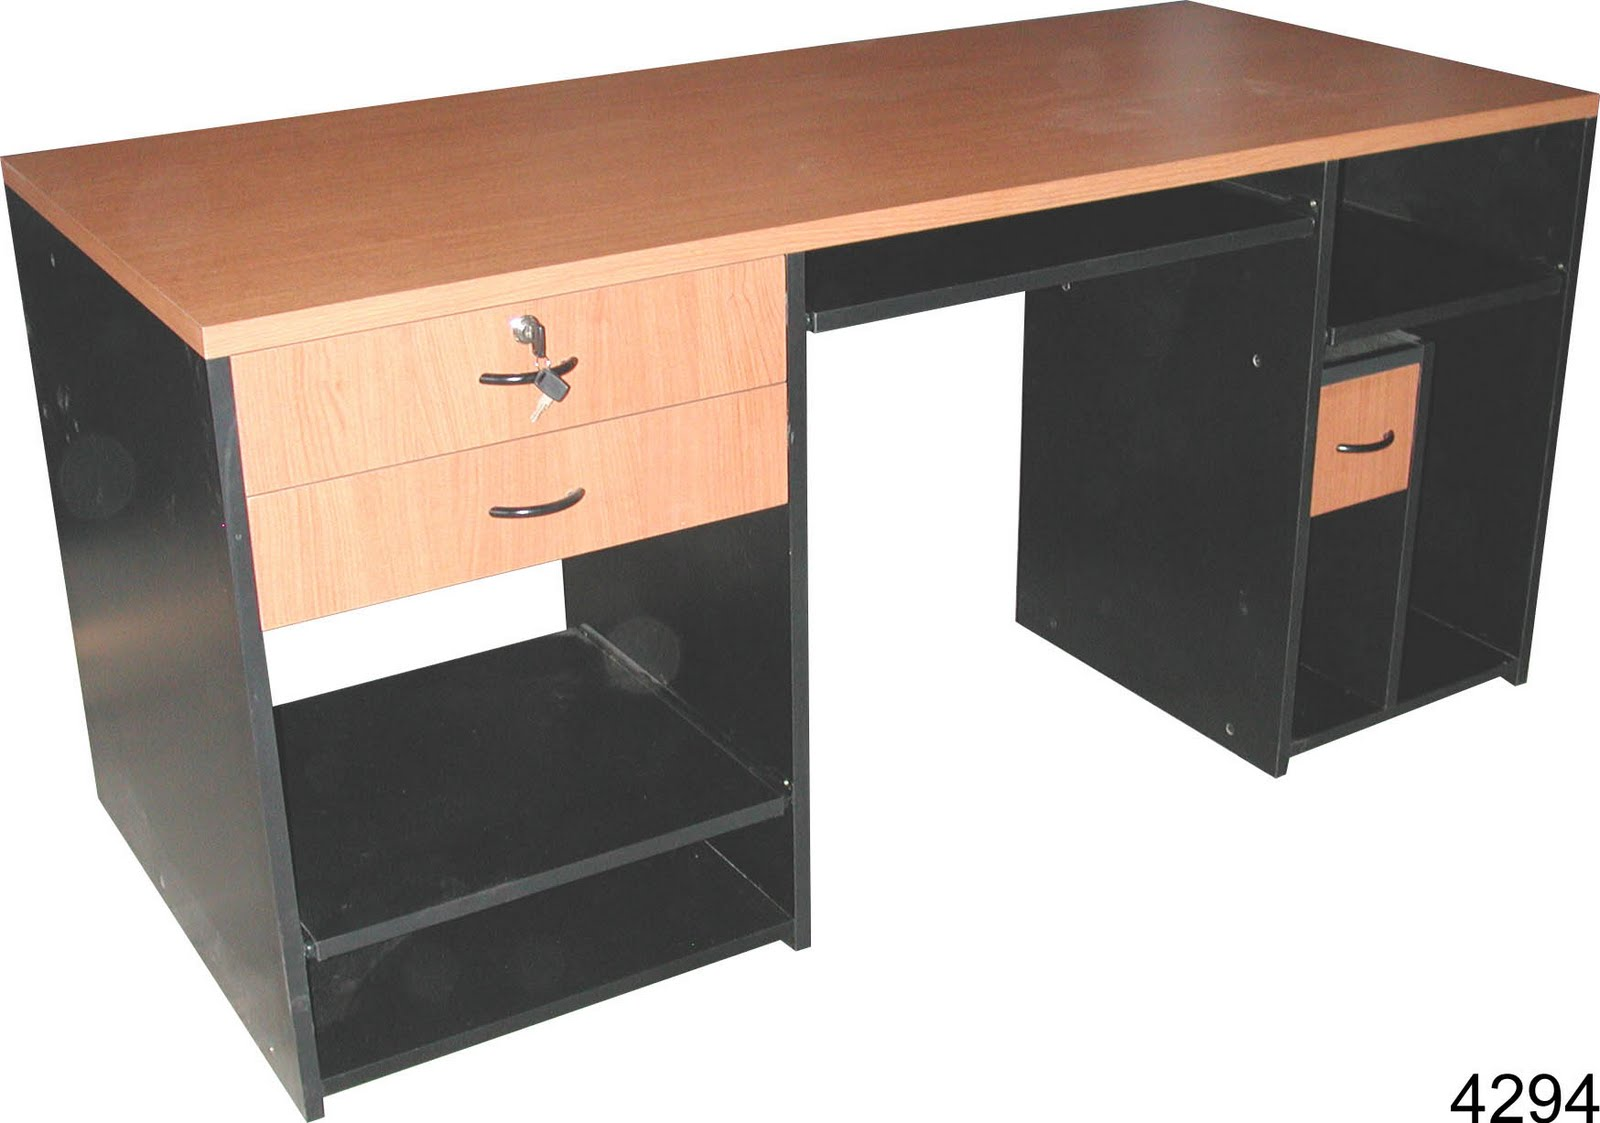 Tipos de muebles de oficina idea creativa della casa e for Diferentes tipos de muebles